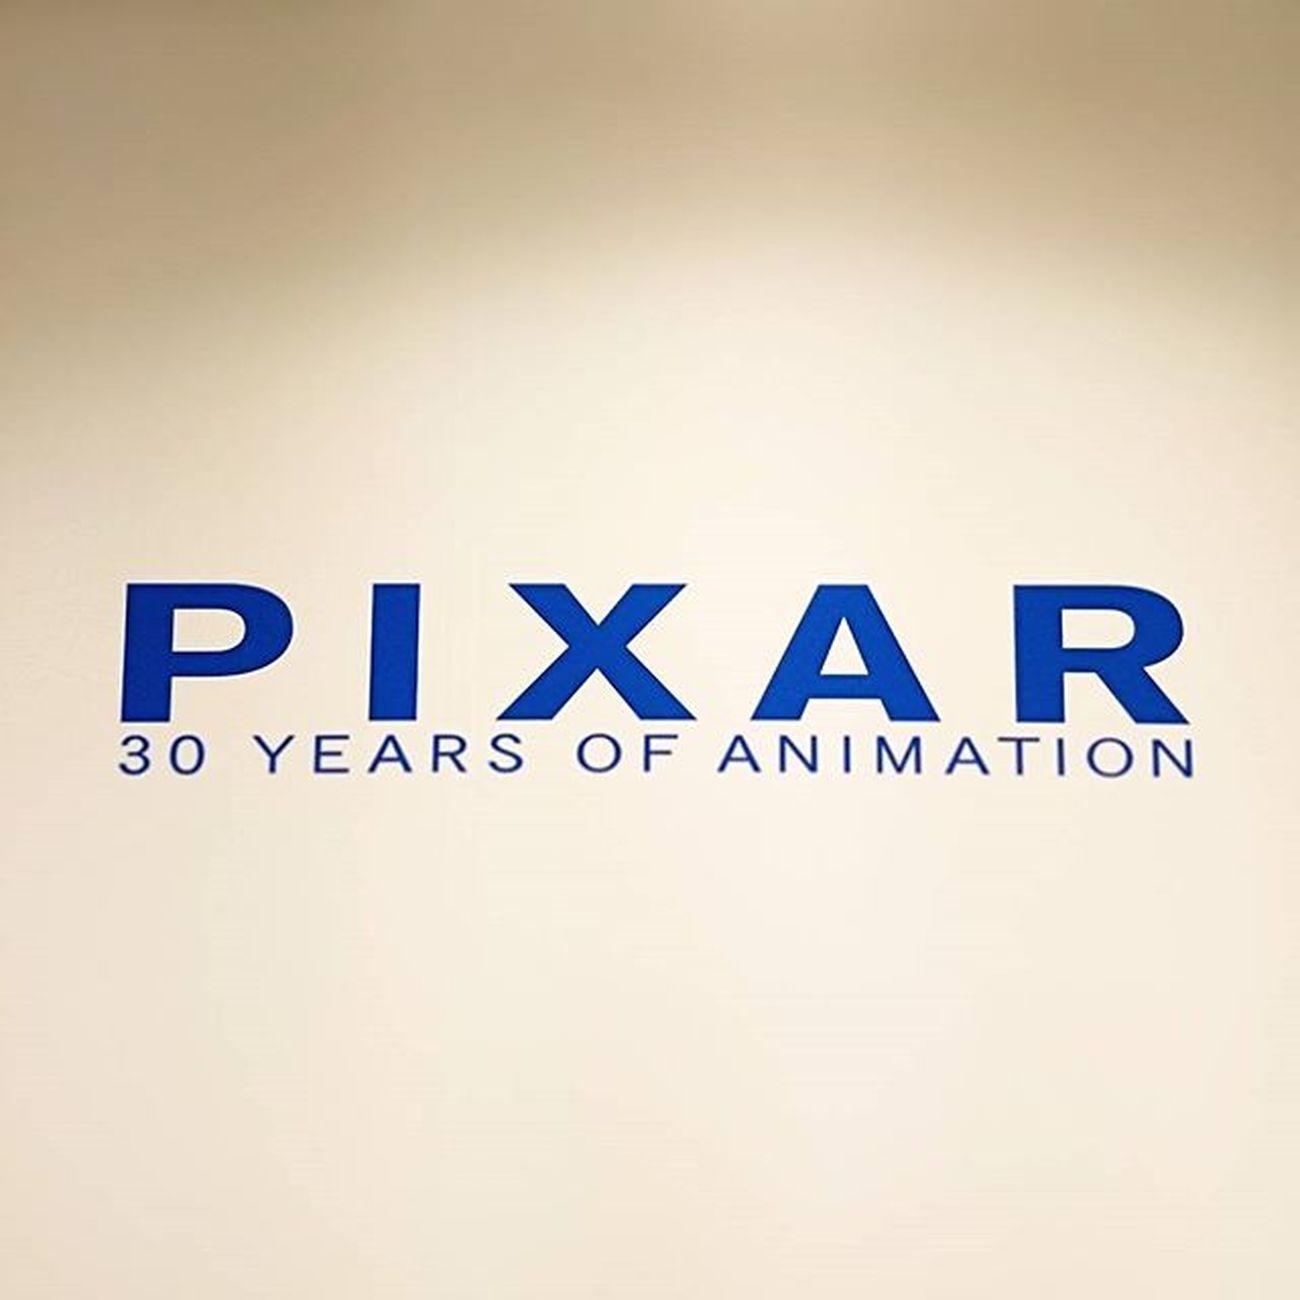 Pixar  と同じ年♪ 素晴らしかった、PIXAR展